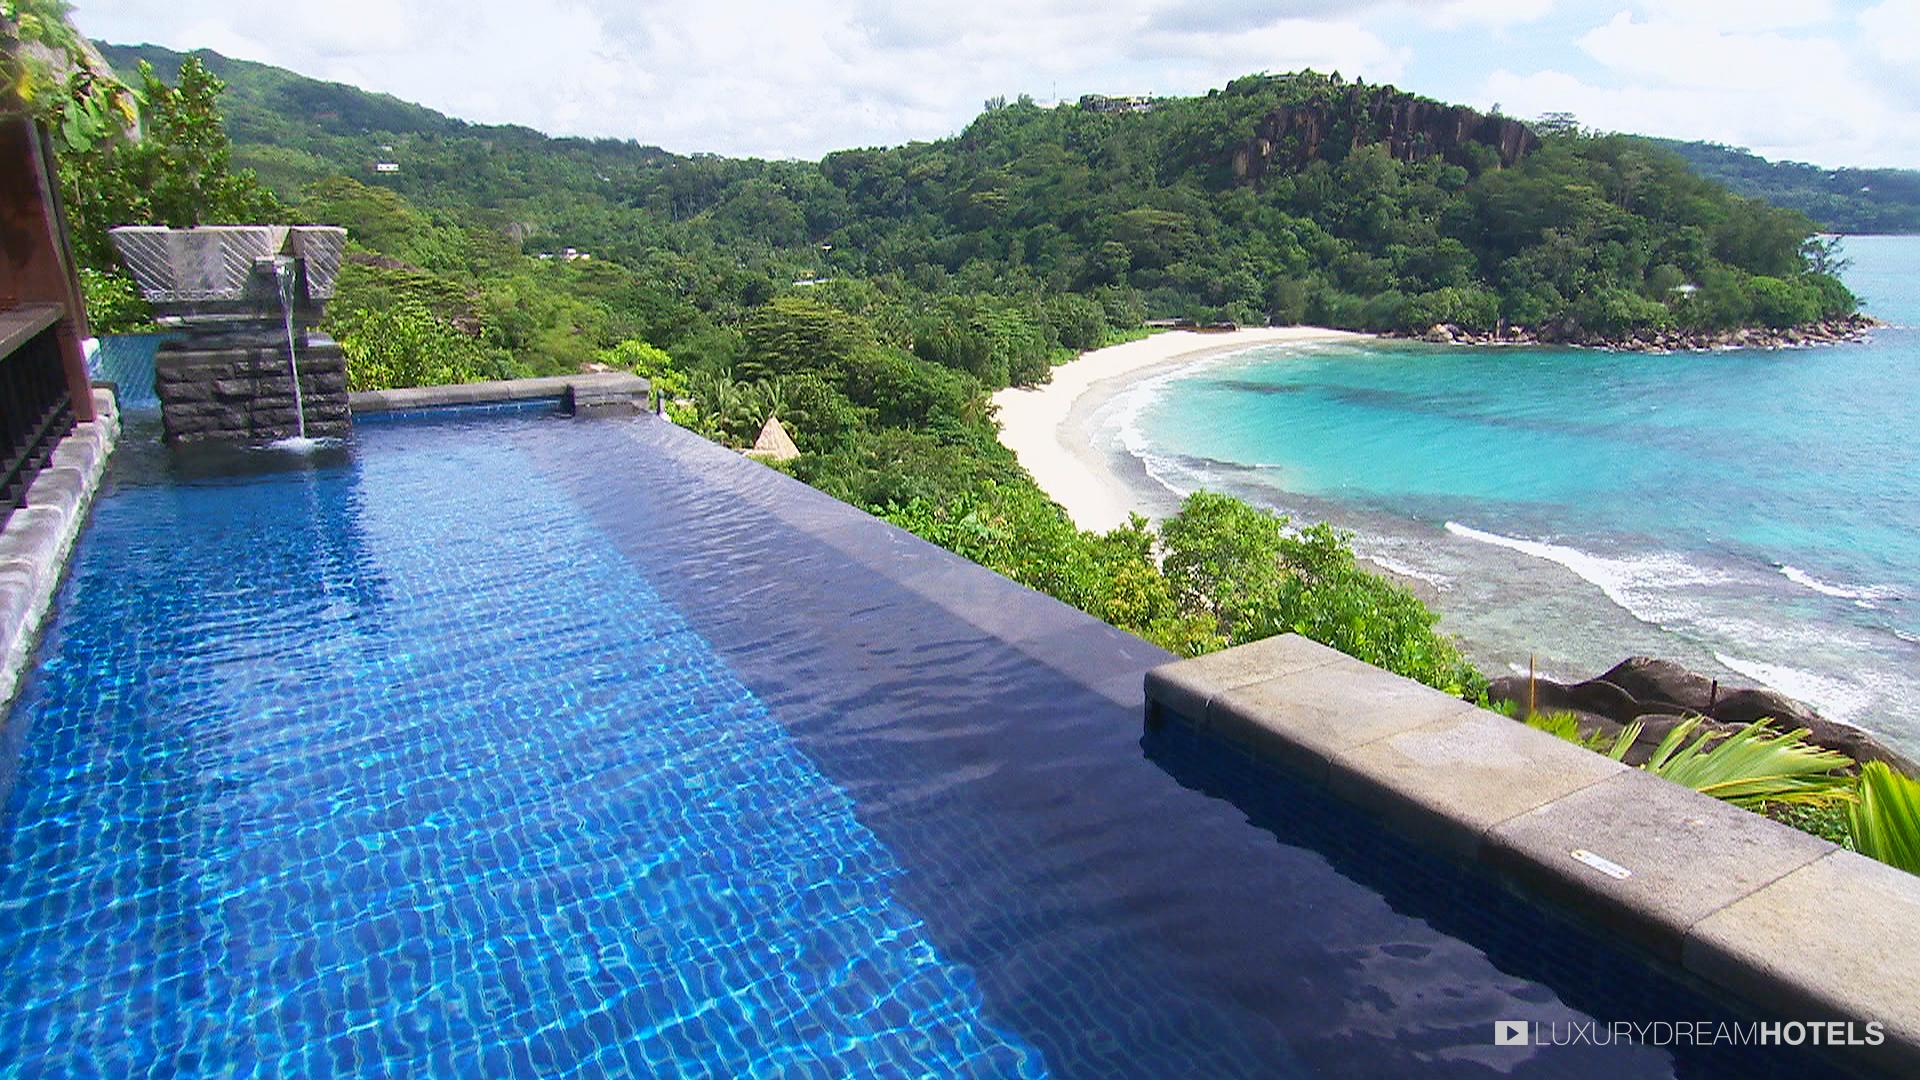 Un affaccio sulla costa / luxurydreamhotels